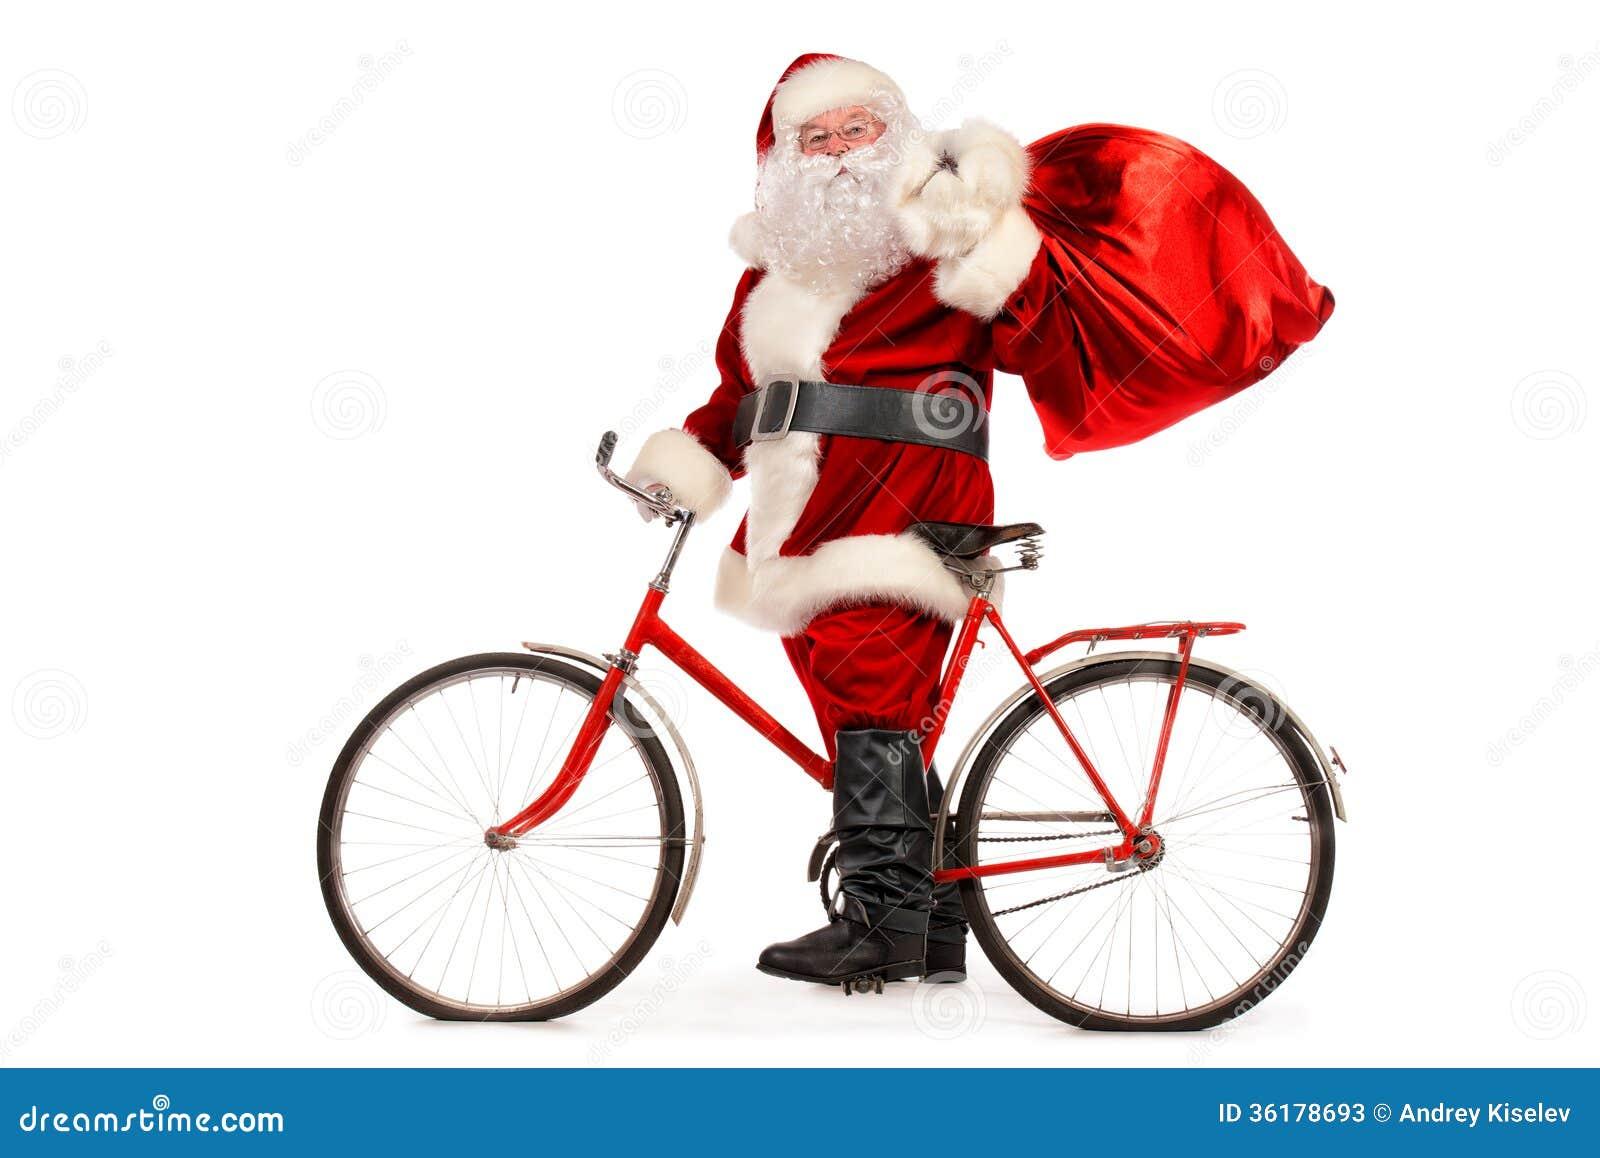 Santa Claus Rides The Bicycle Royalty-Free Stock Photo ...